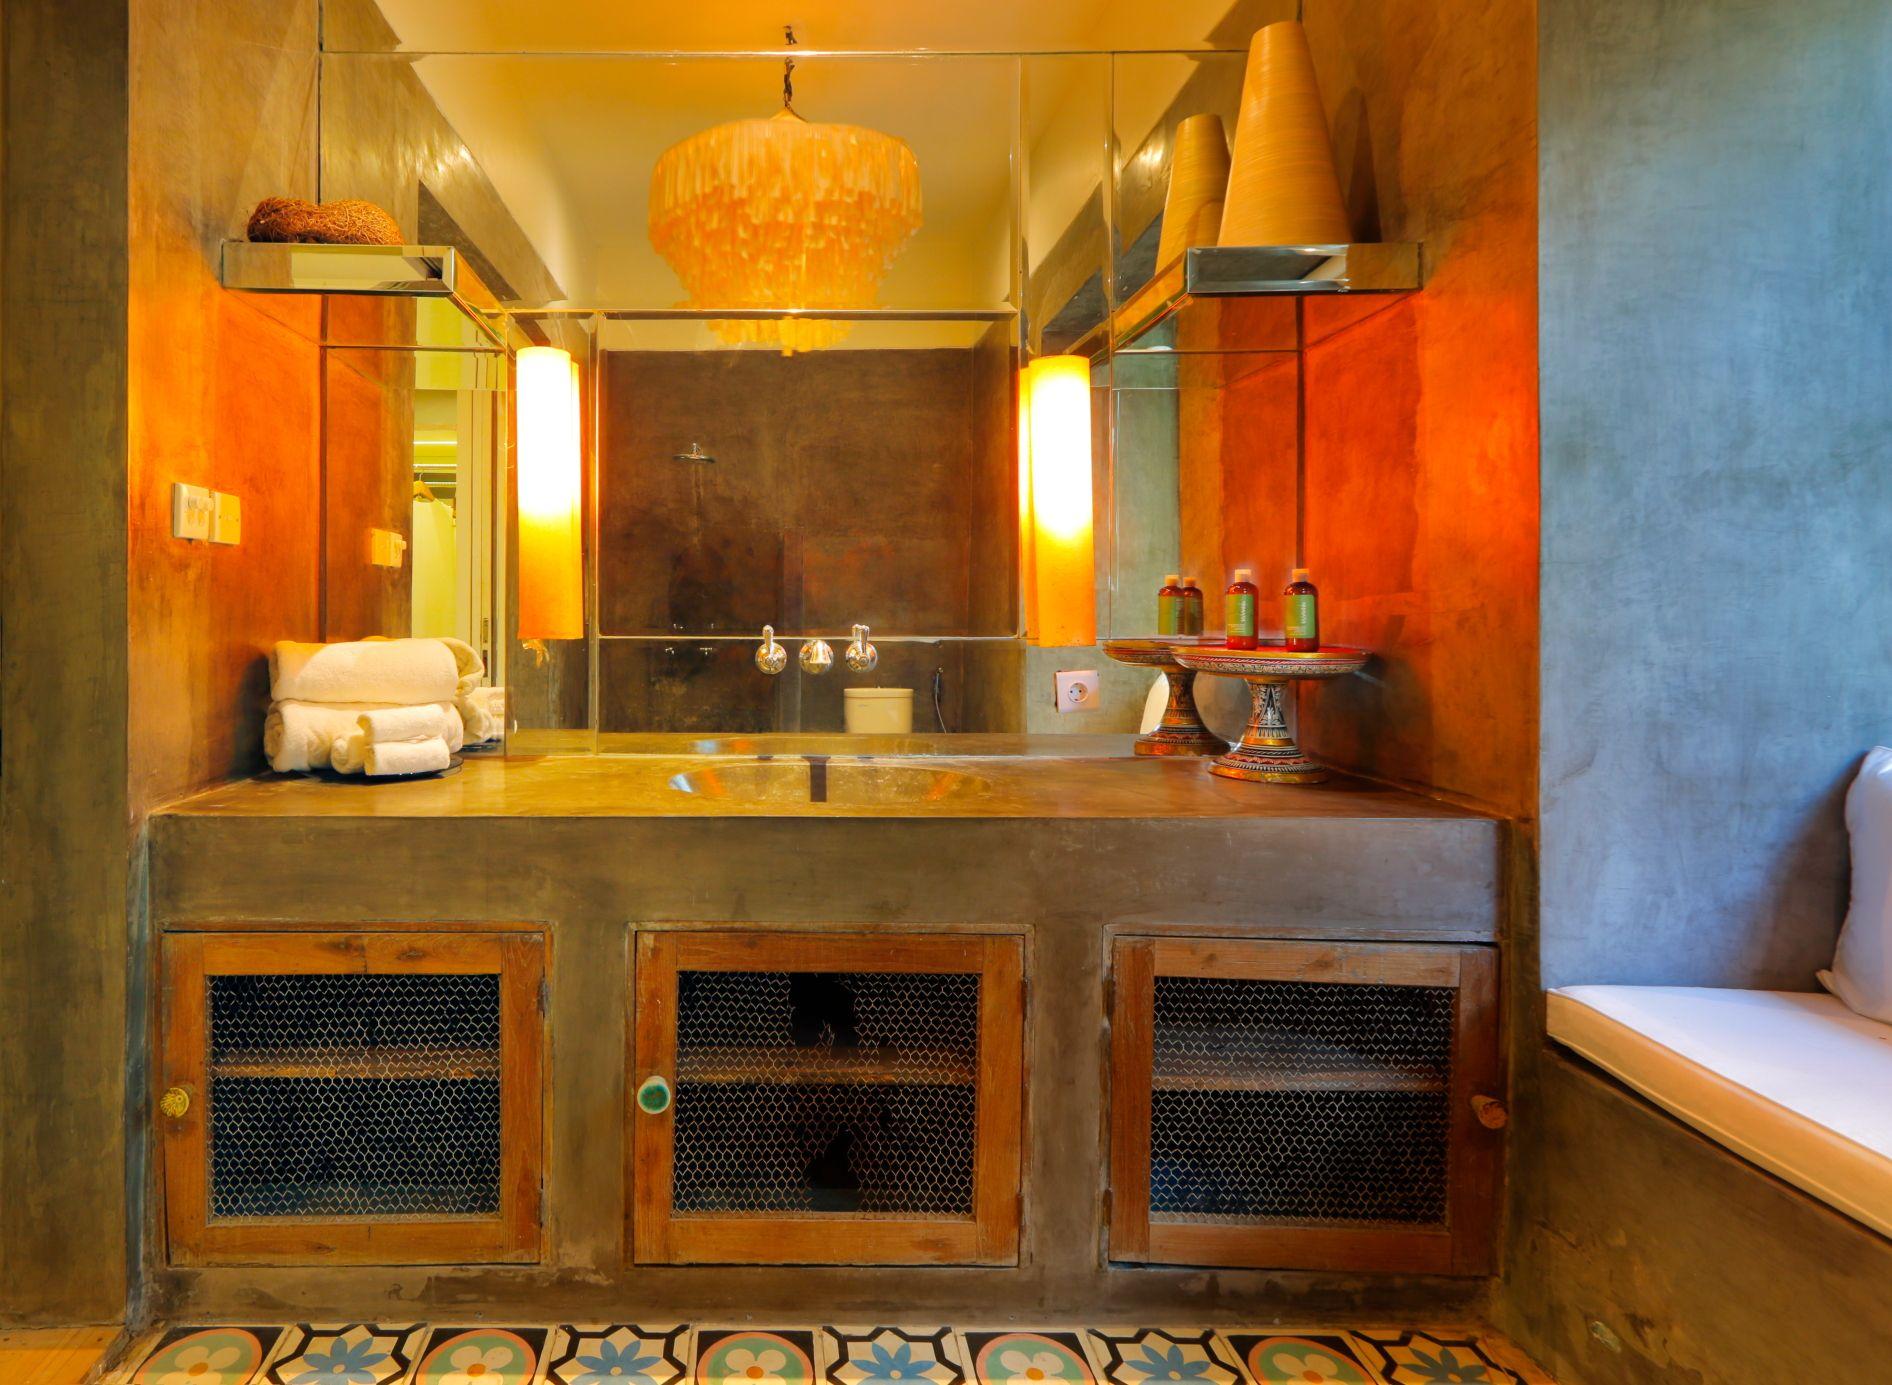 Guest Room Bathroom Interior Design By Word Of